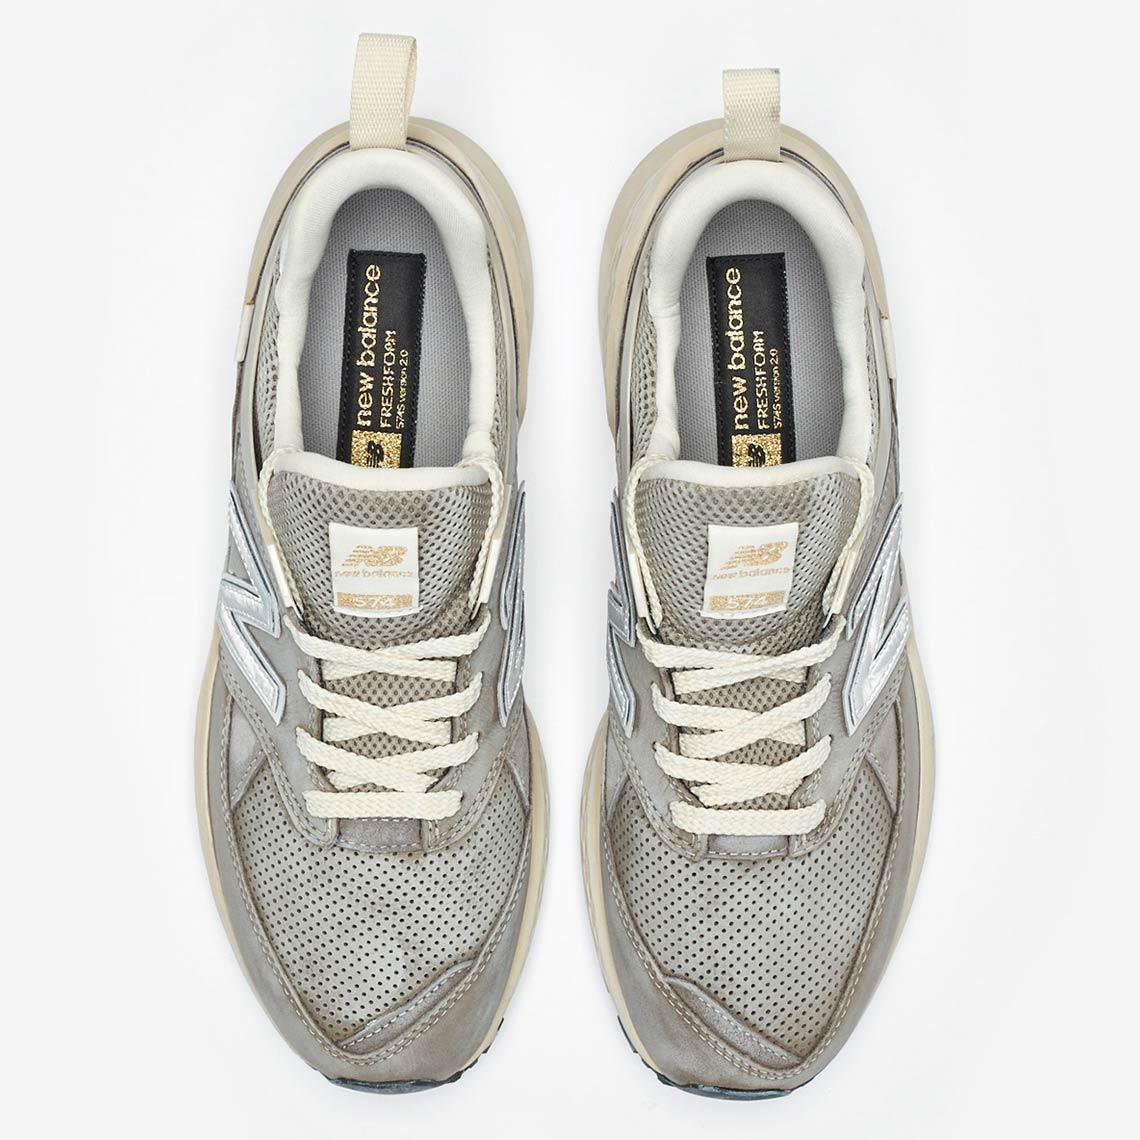 new arrival f2e3e 33e12 New Balance MS574 Buying Guide + Store Links | SneakerNews.com